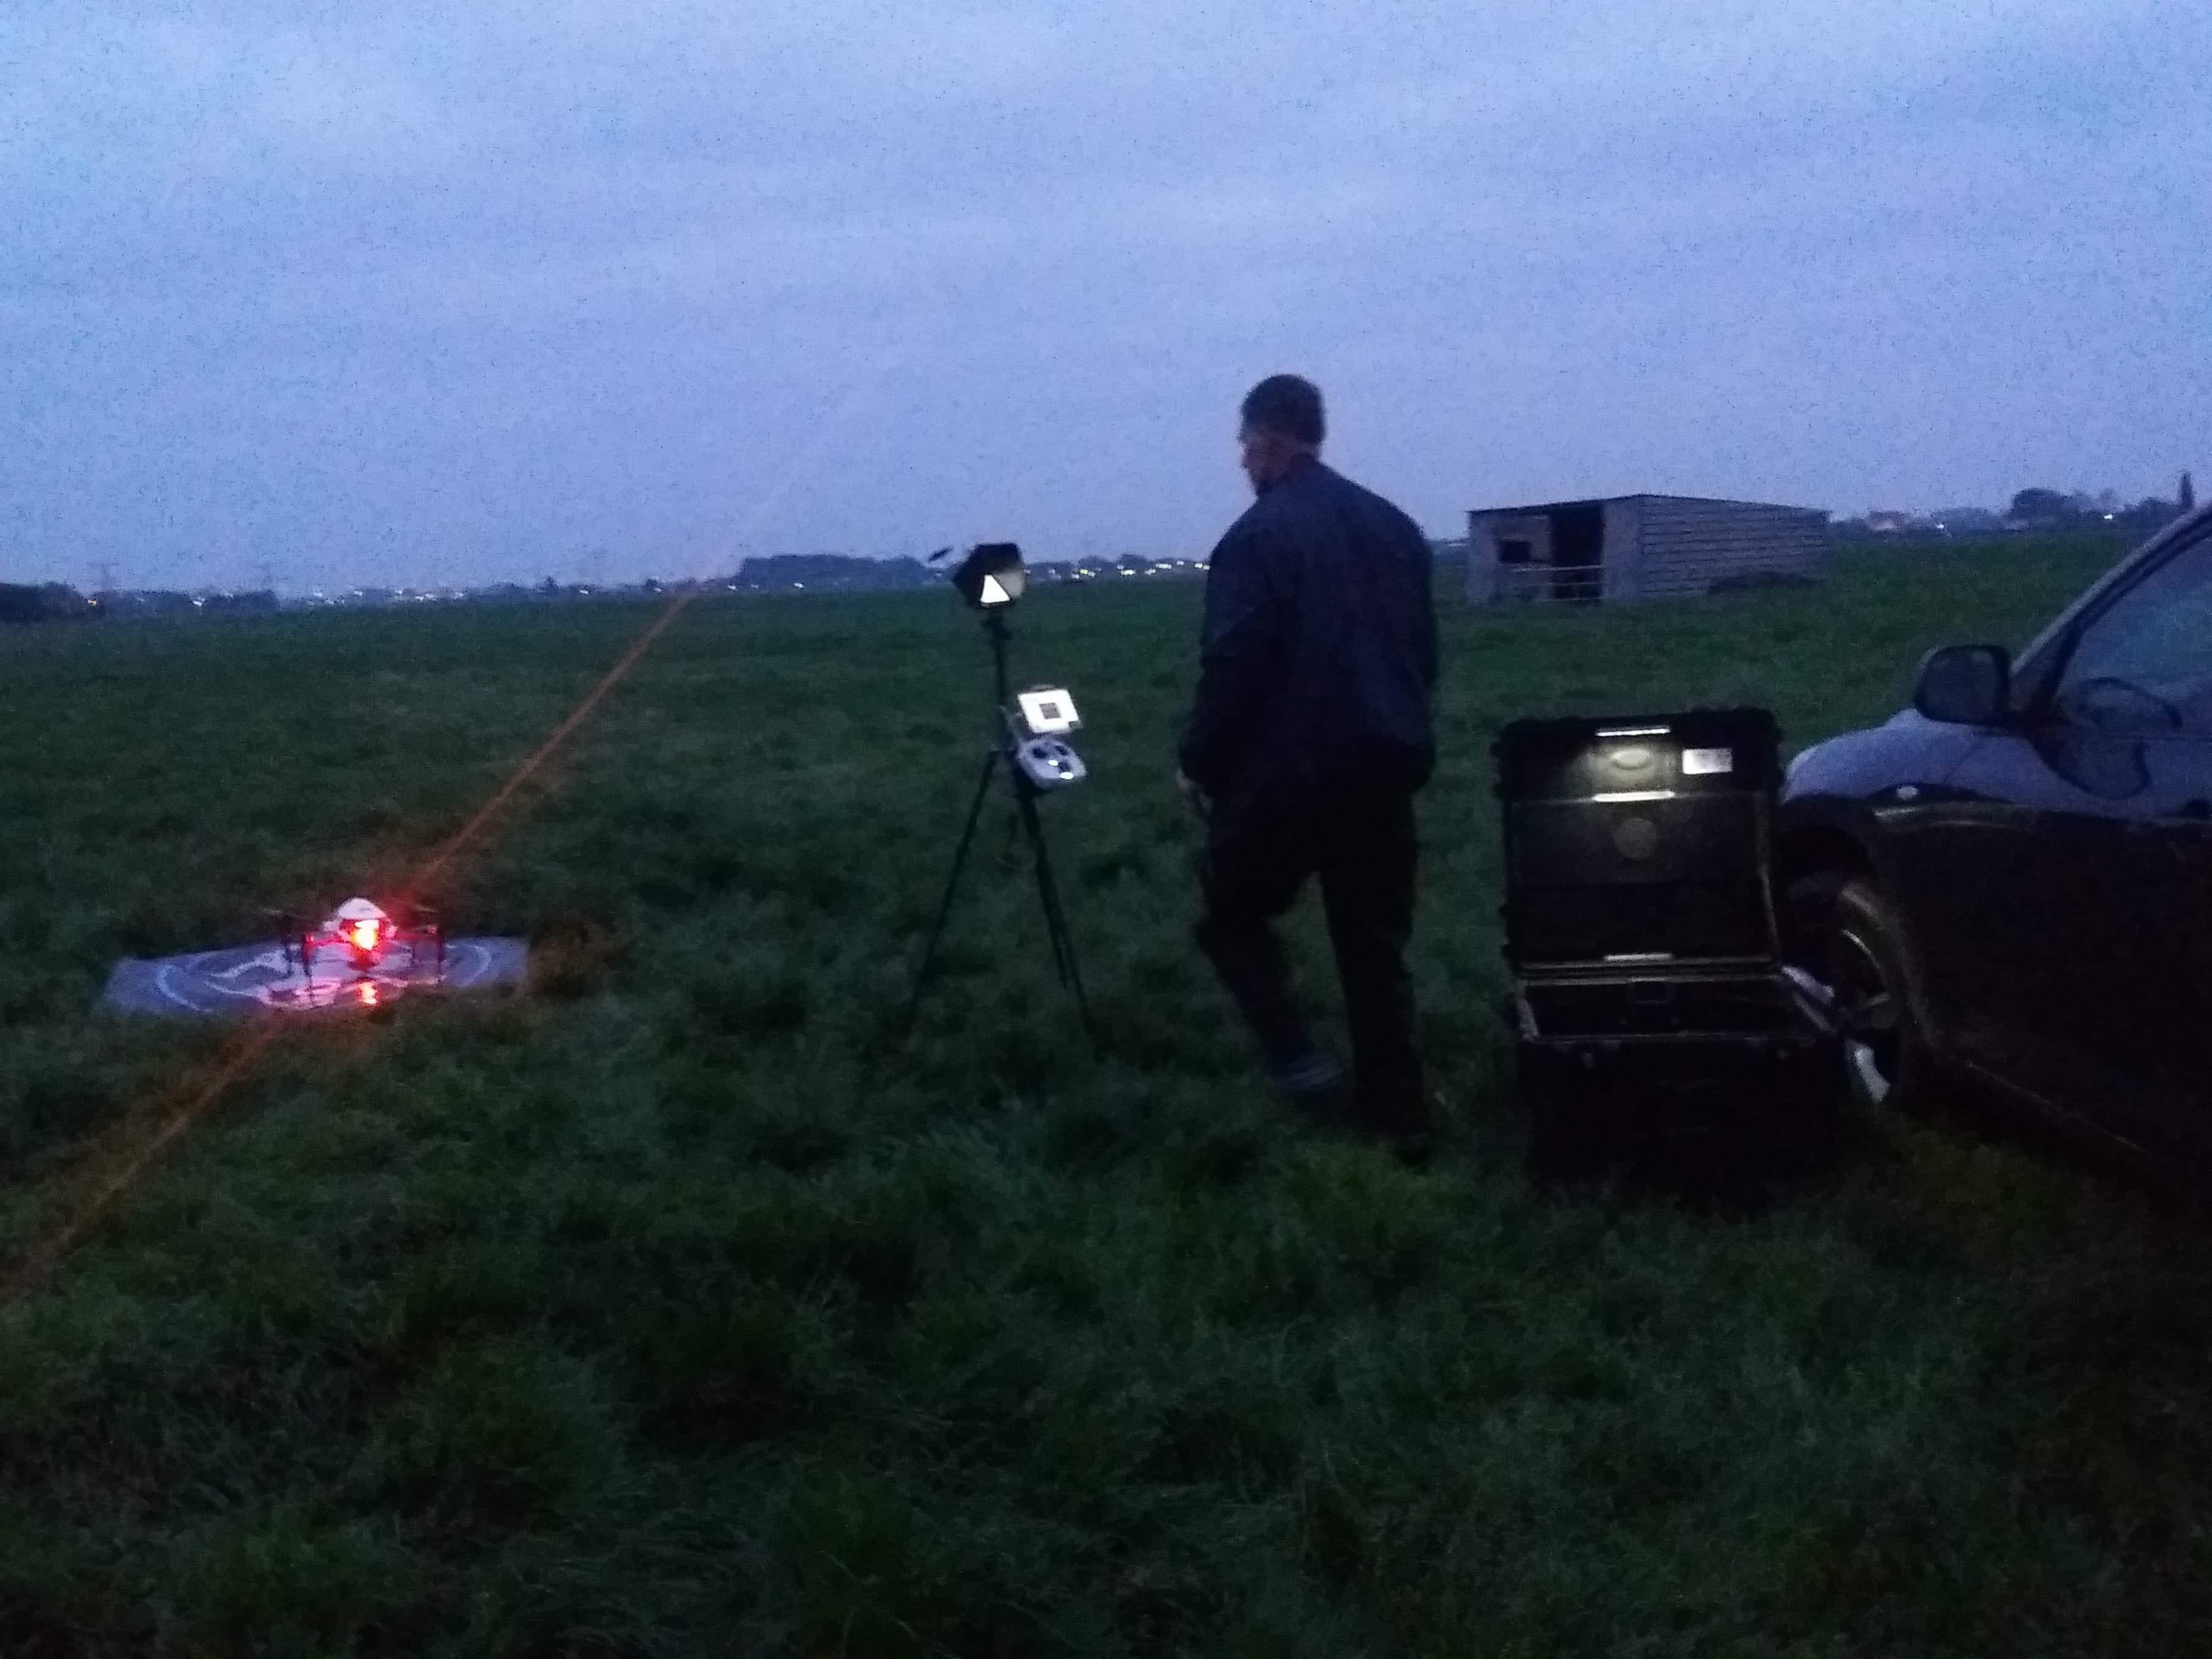 Moderne boeren monitoren weidevogels met een drone, melkveehouder legt in Muider polder stuk plas-drasgebied aan